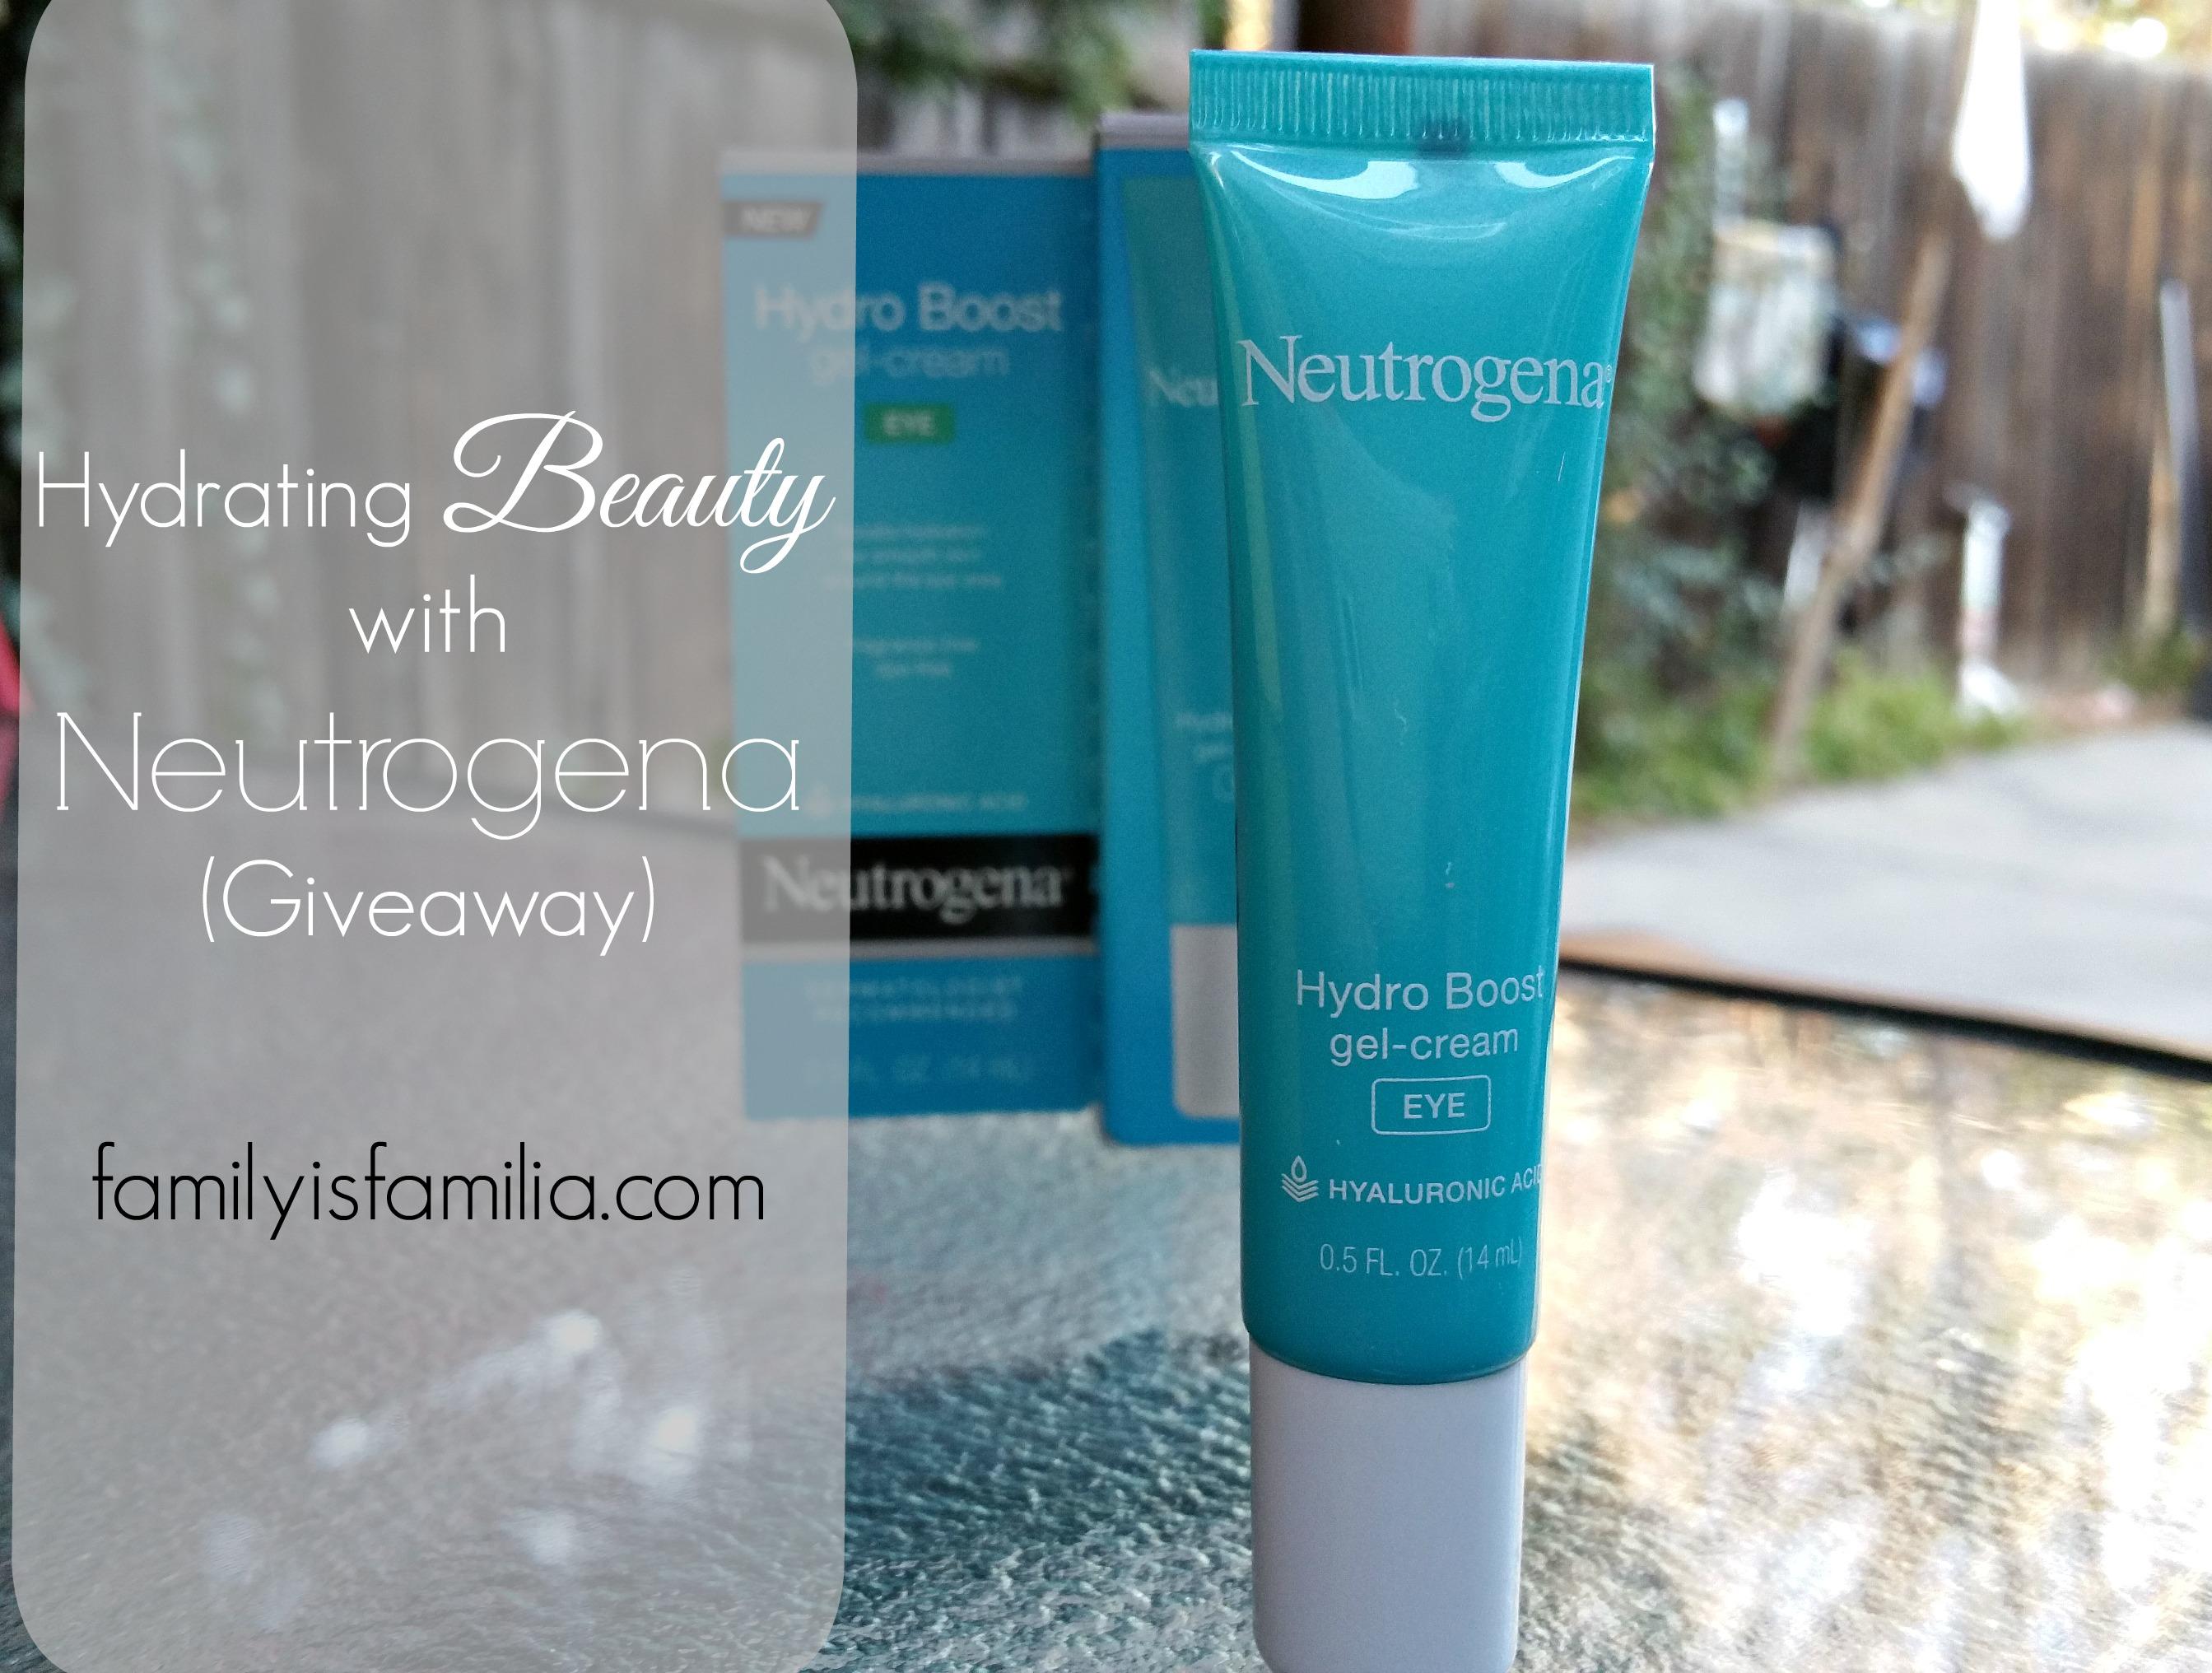 hydrating-beauty-neutrogena-giveaway